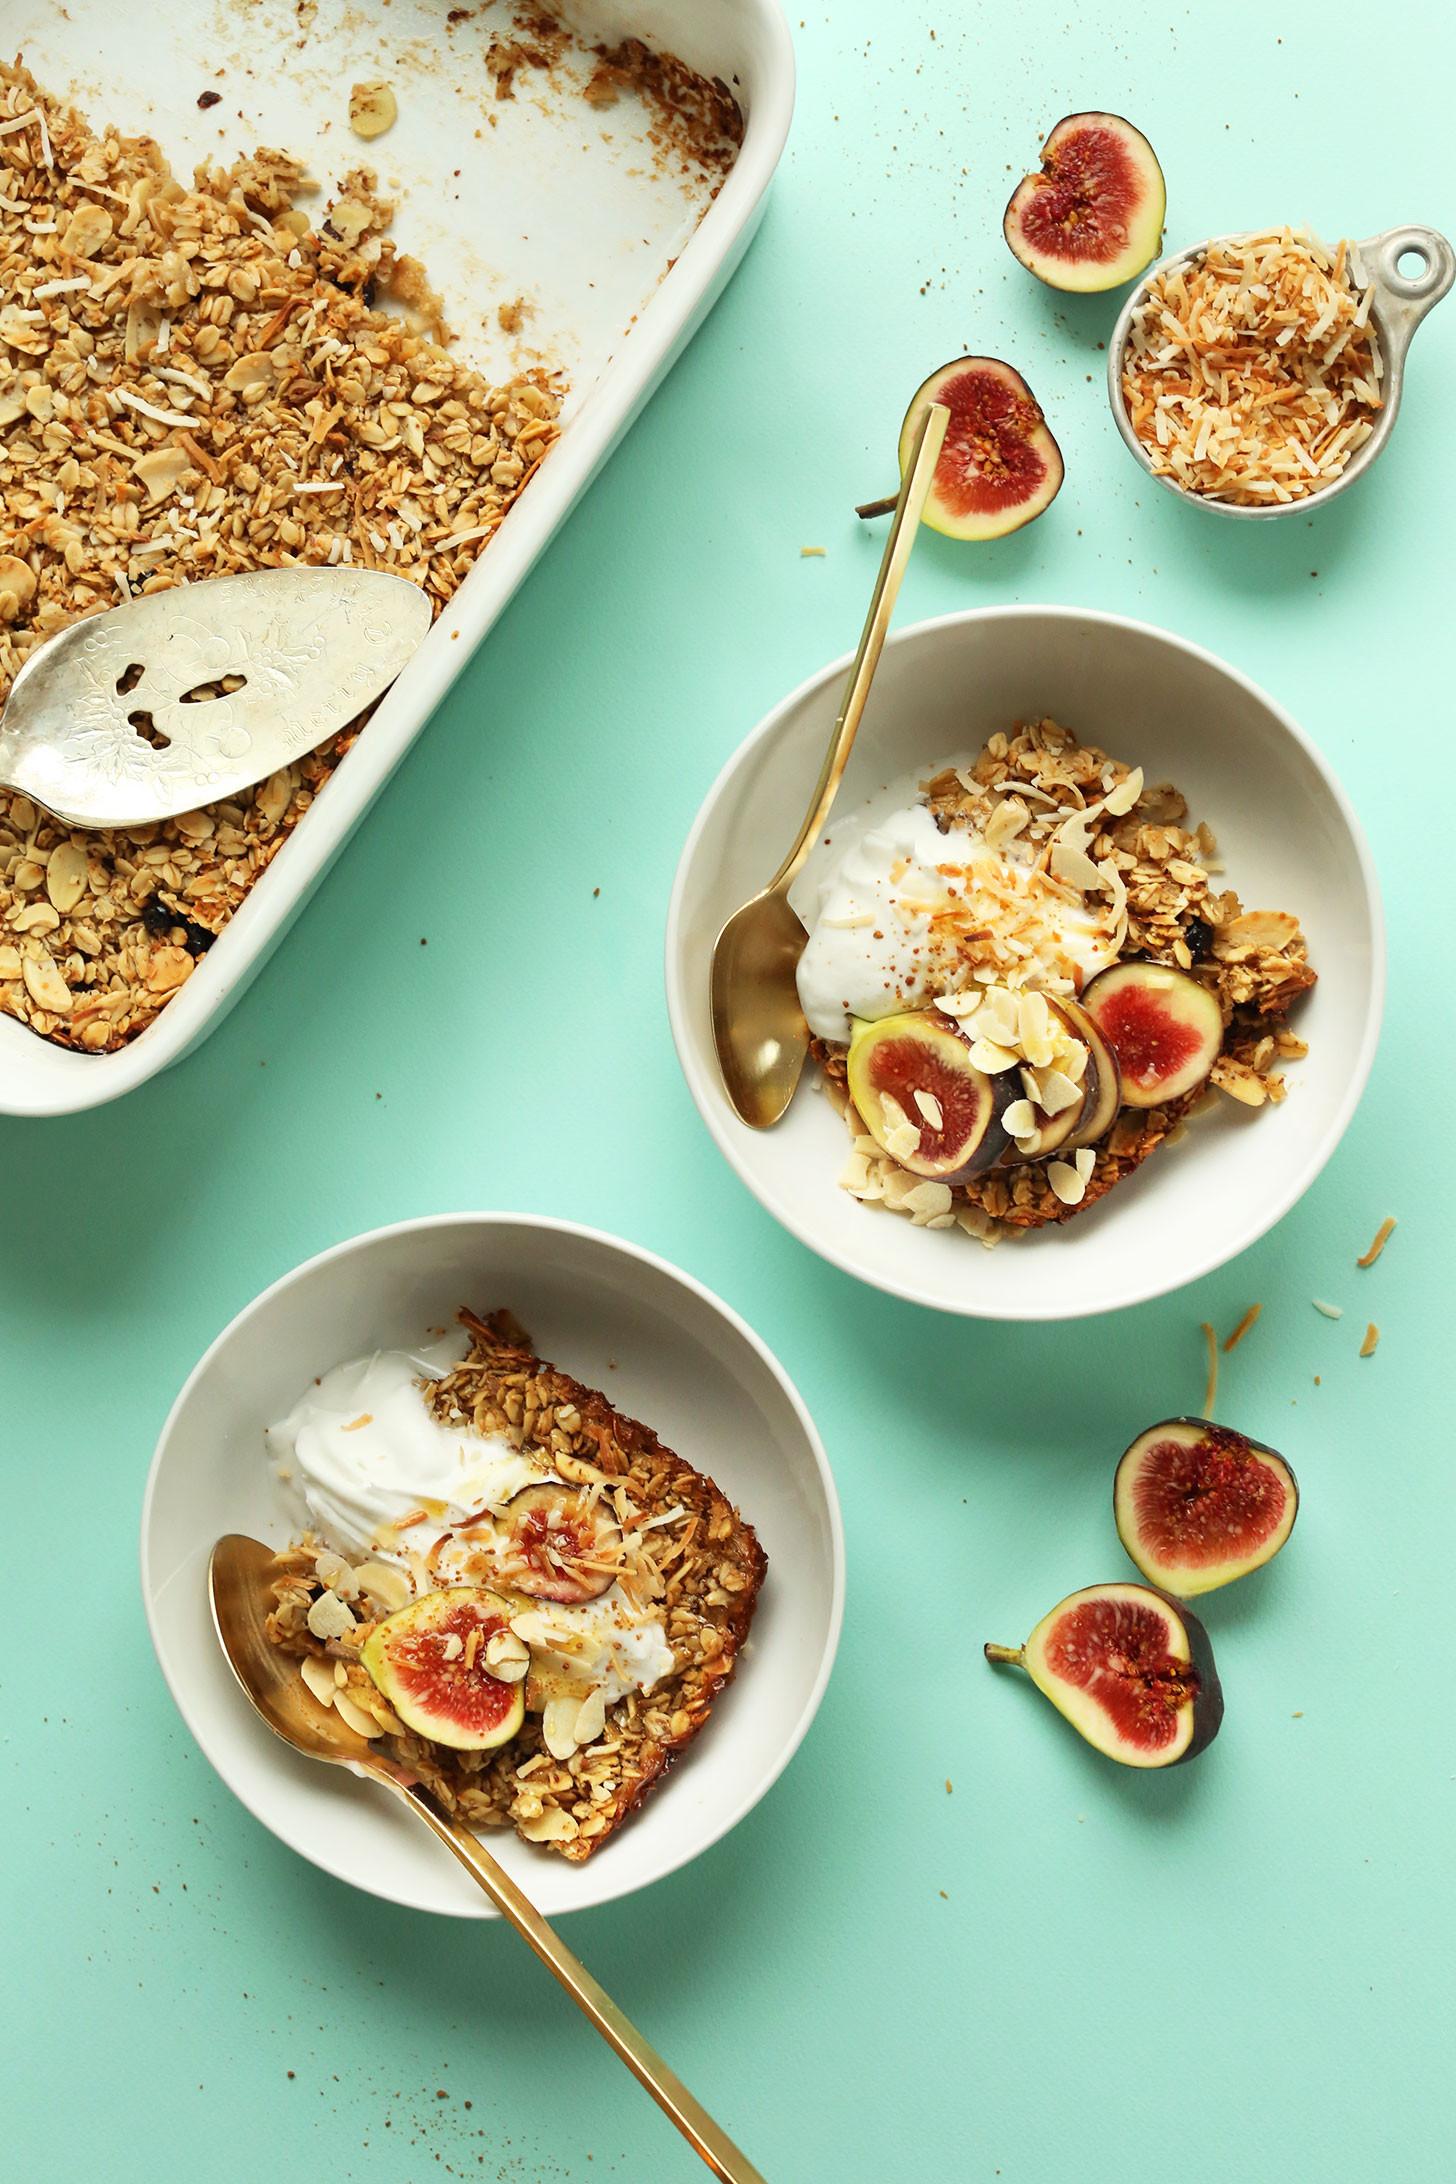 Healthy Oatmeal Breakfast Recipes  Coconut Baked Oatmeal